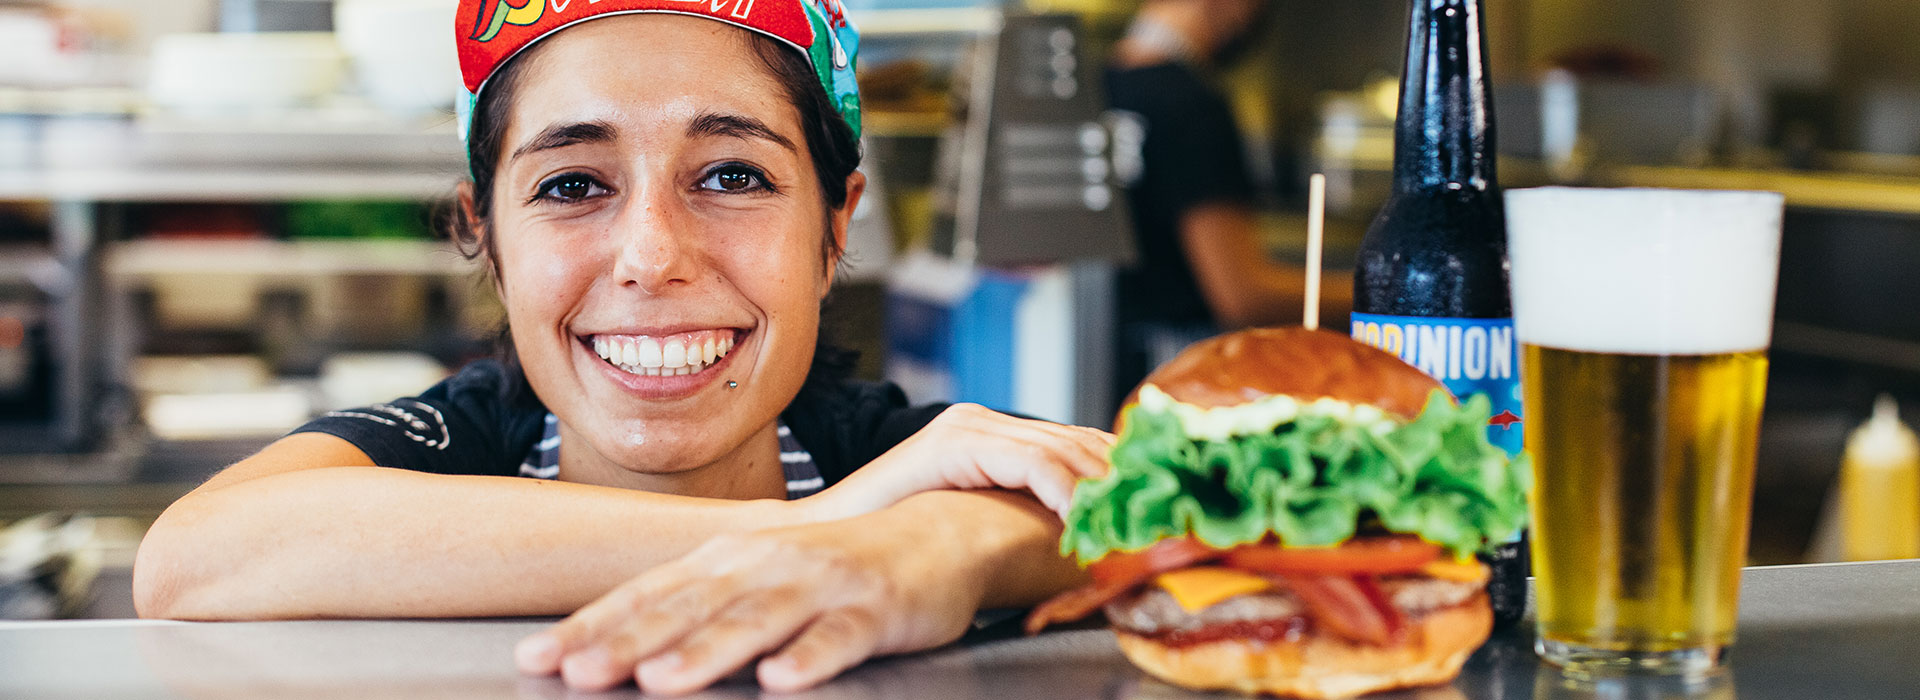 staff-bonelli_gli-hamburger-più-buoni-d'italia-2_desktop